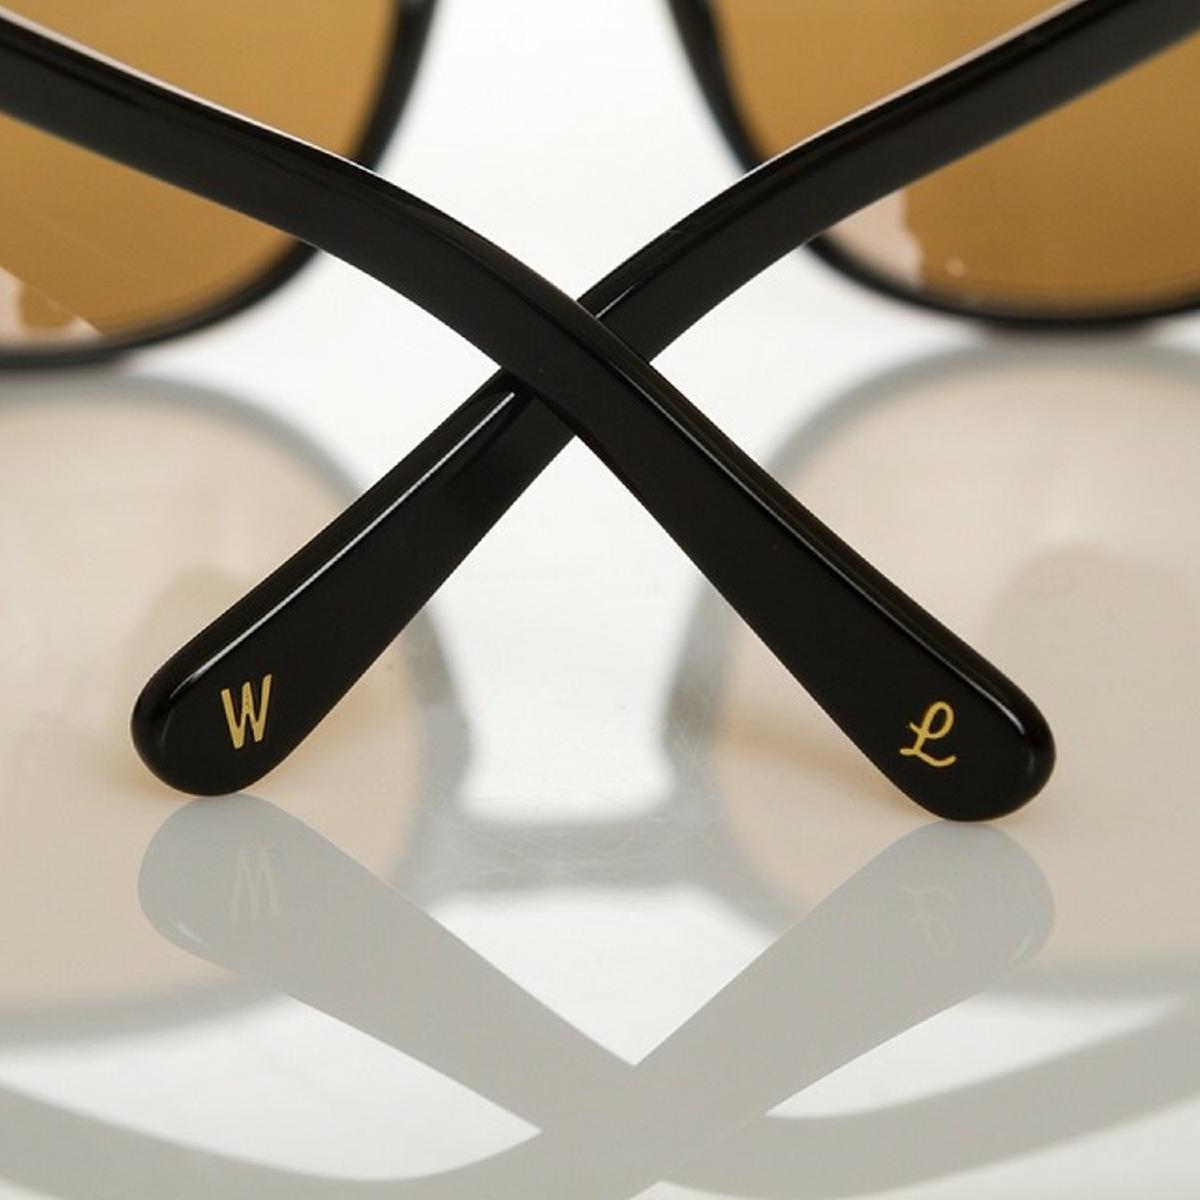 WONDERLAND ワンダーランド サングラス STATELINE Gloss BlackXGray CZ